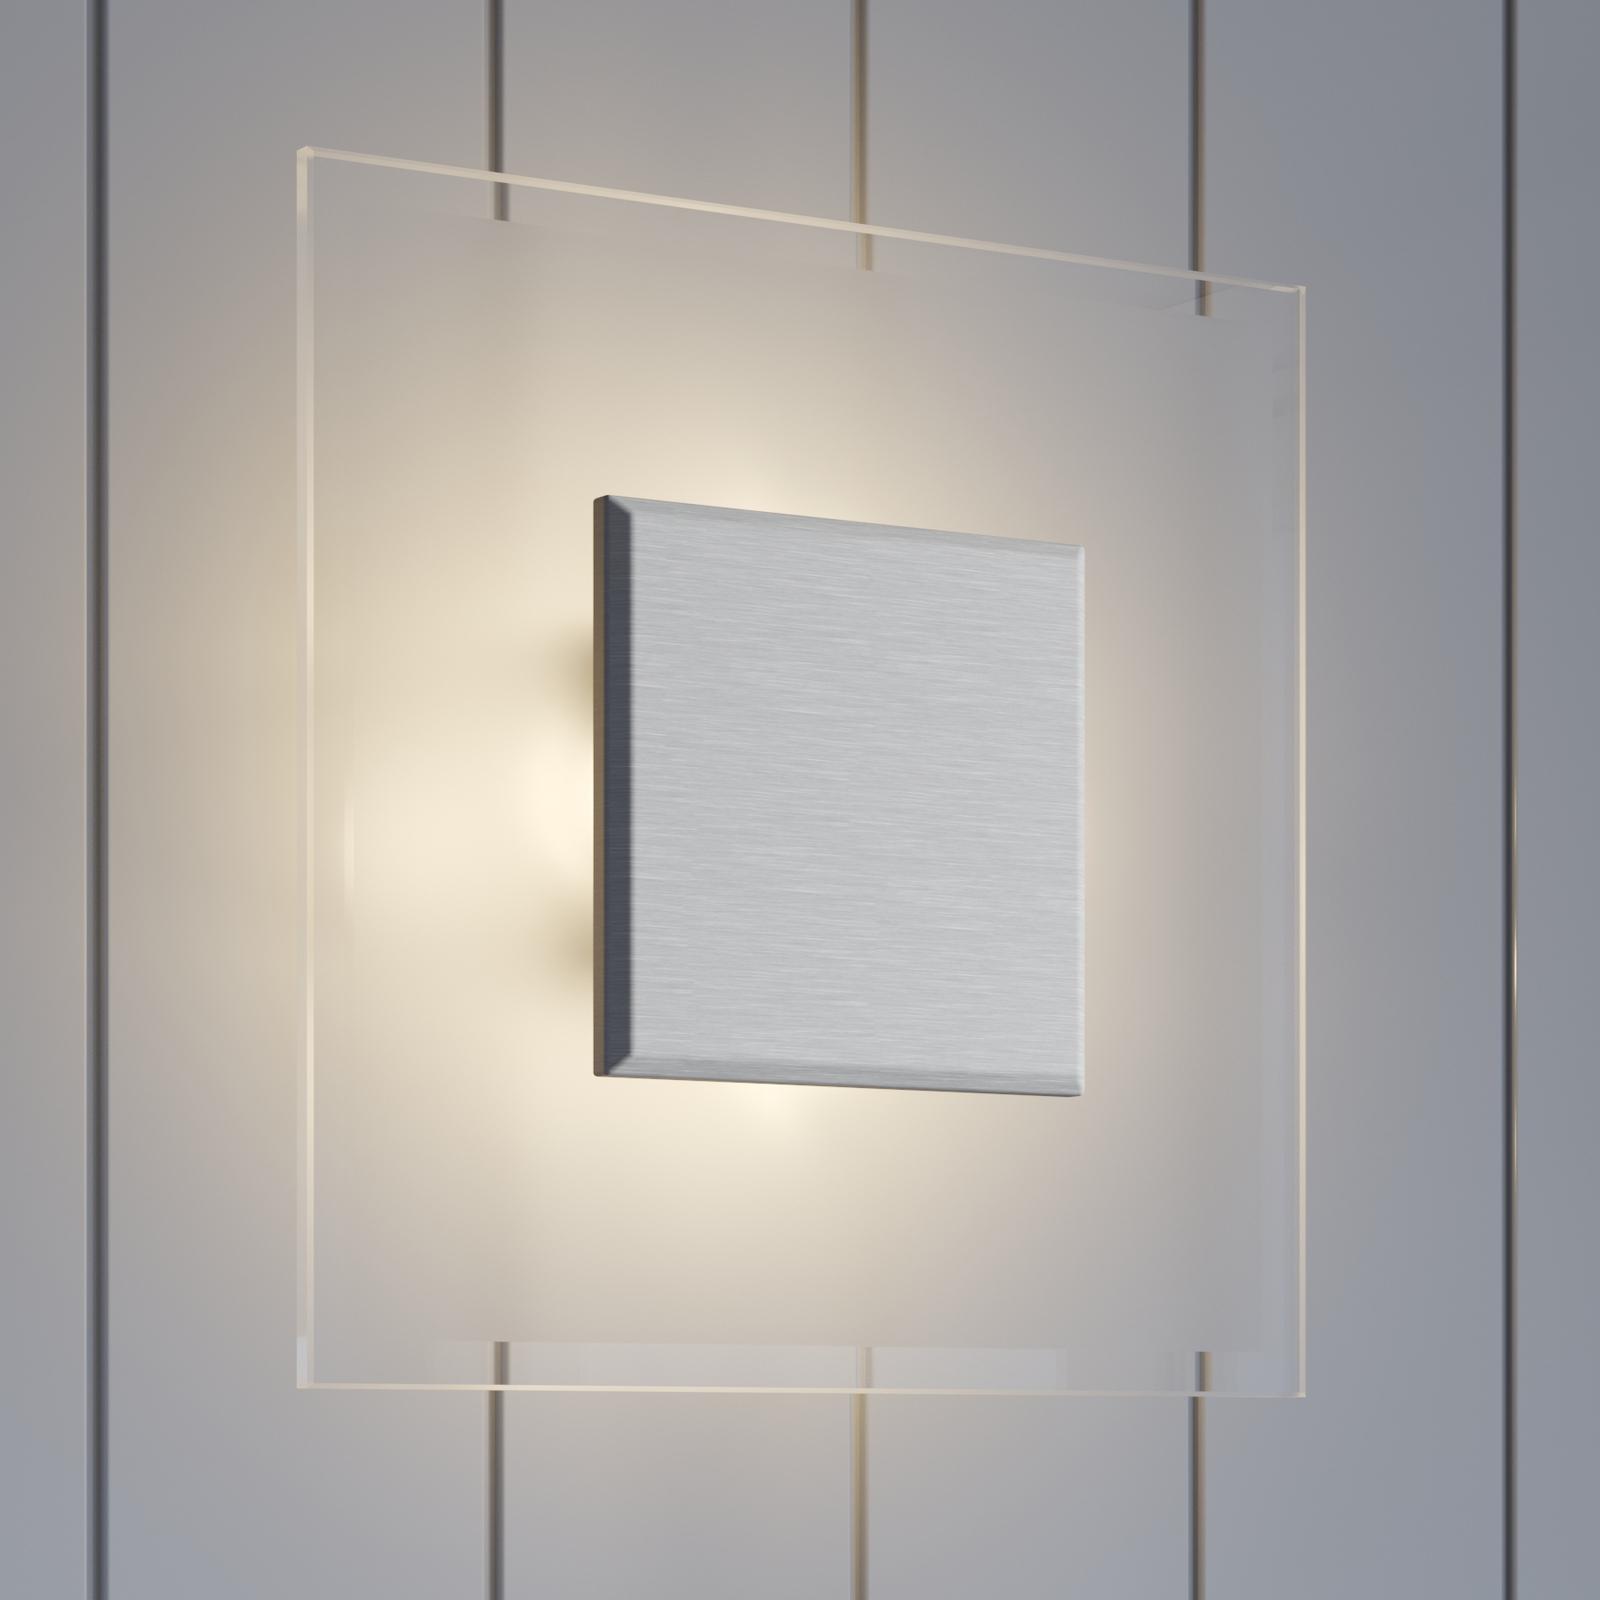 Firkantet LED-taklampe Lole i glass